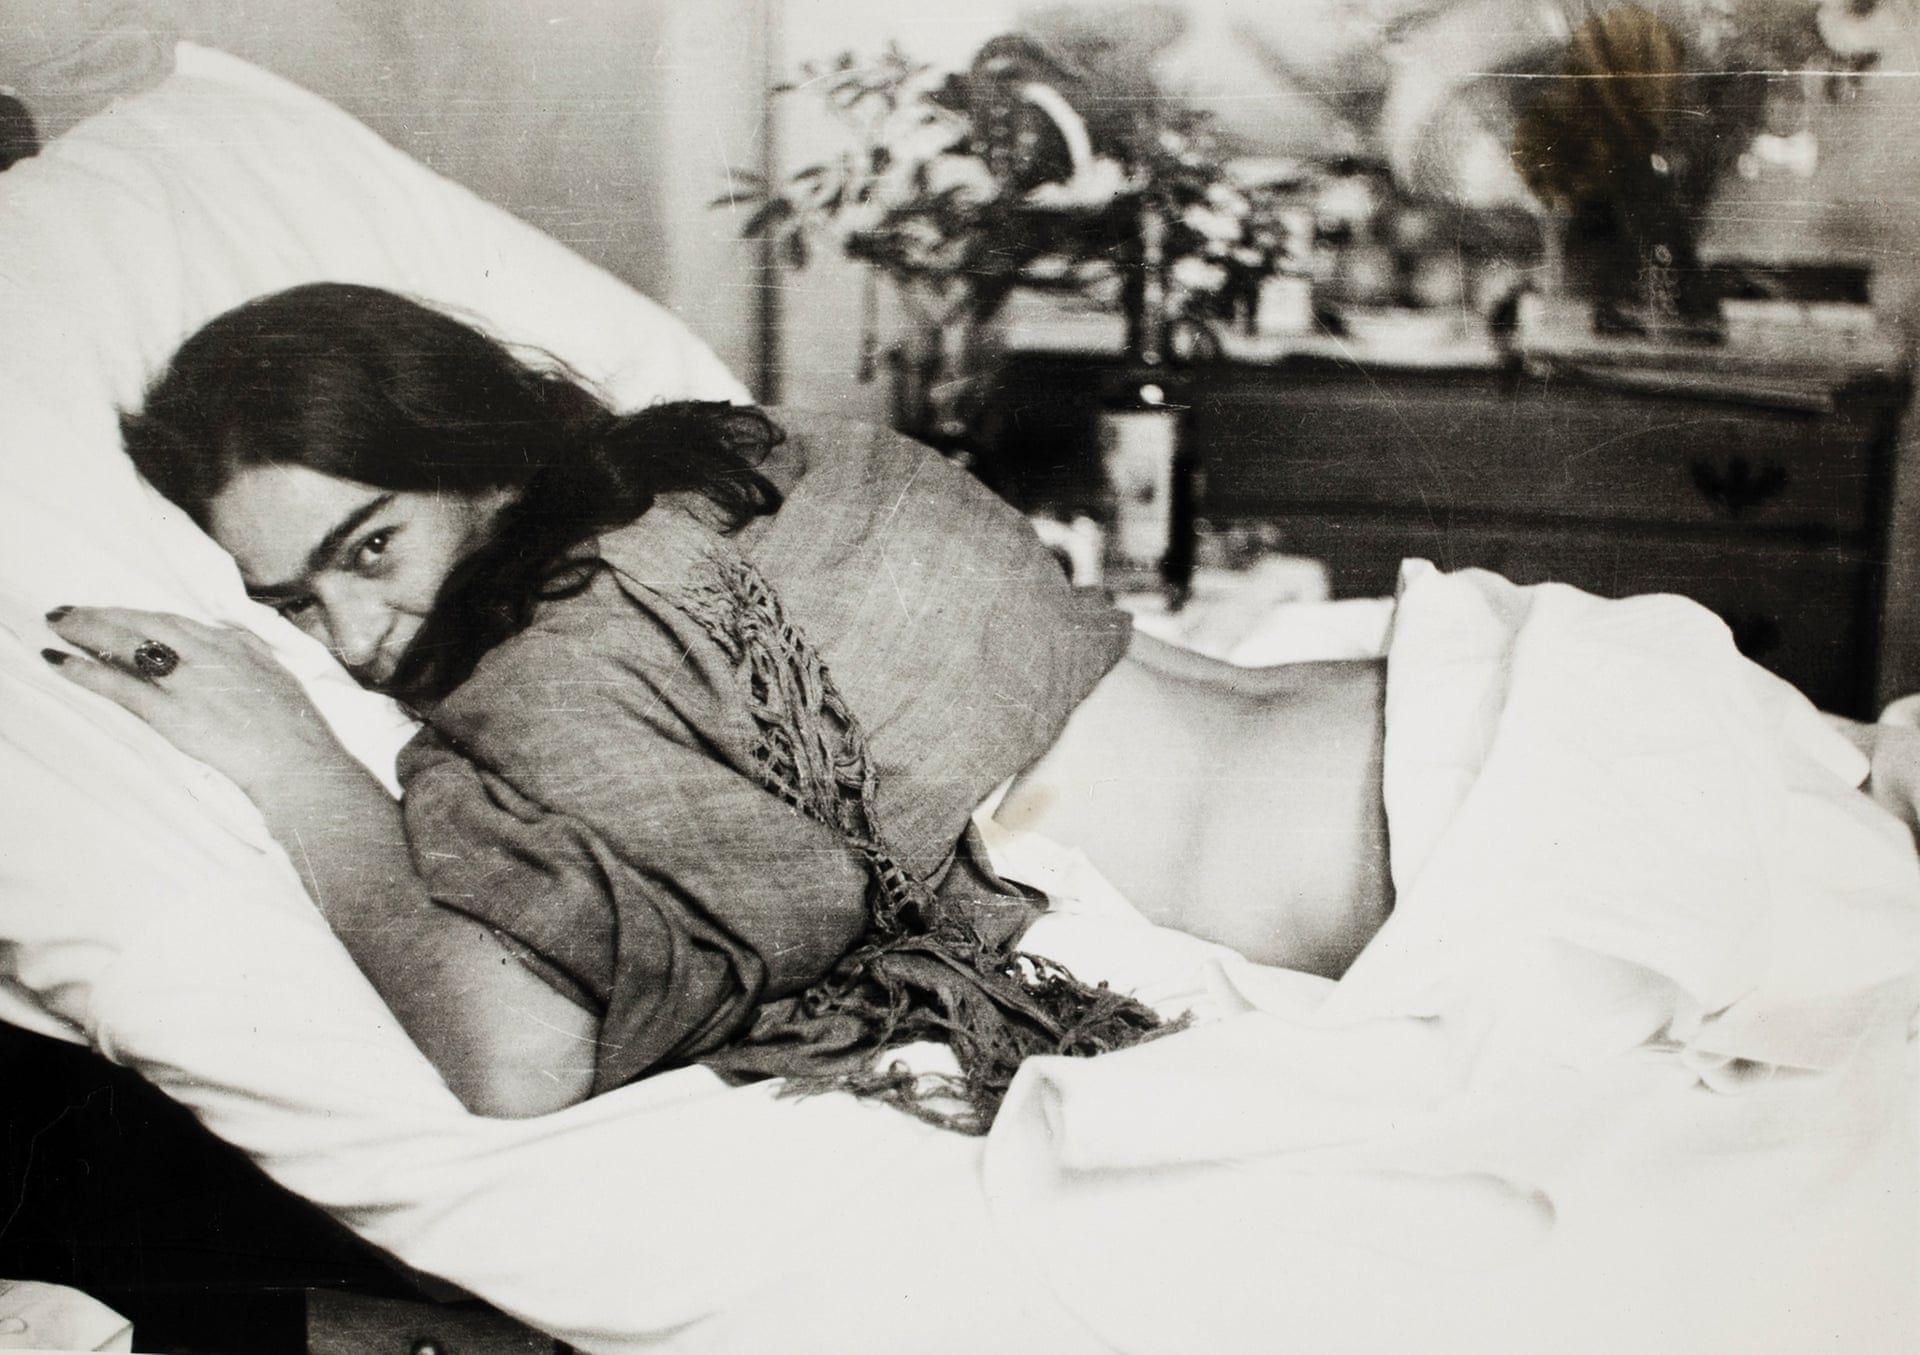 Up close and personal: Frida Kahlo's photo album